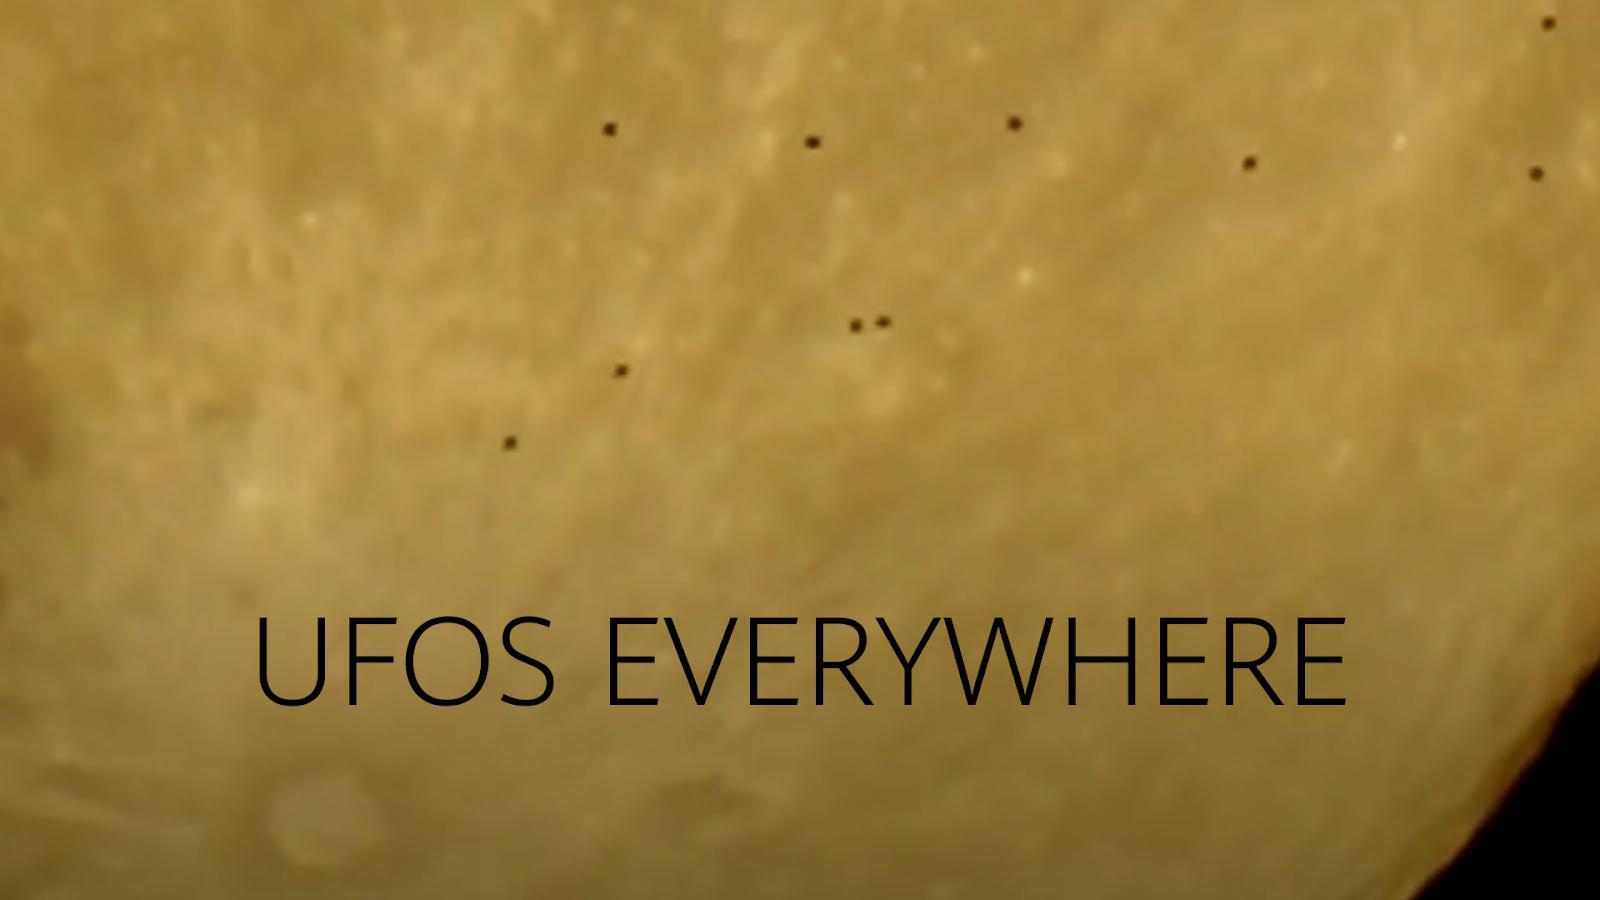 Large Fleet Of UFOs Crossing The Moon